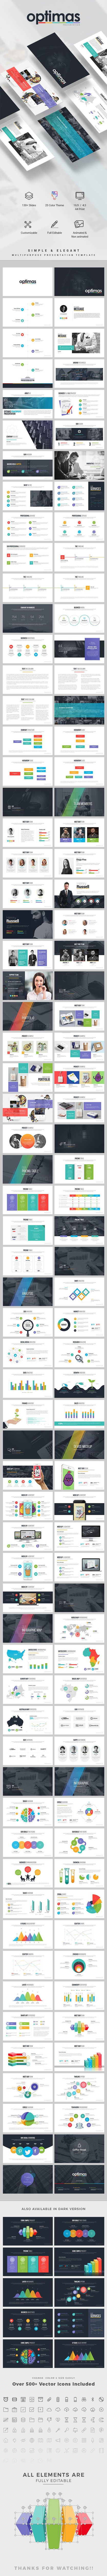 Powerpoint - PowerPoint Templates Presentation Templates